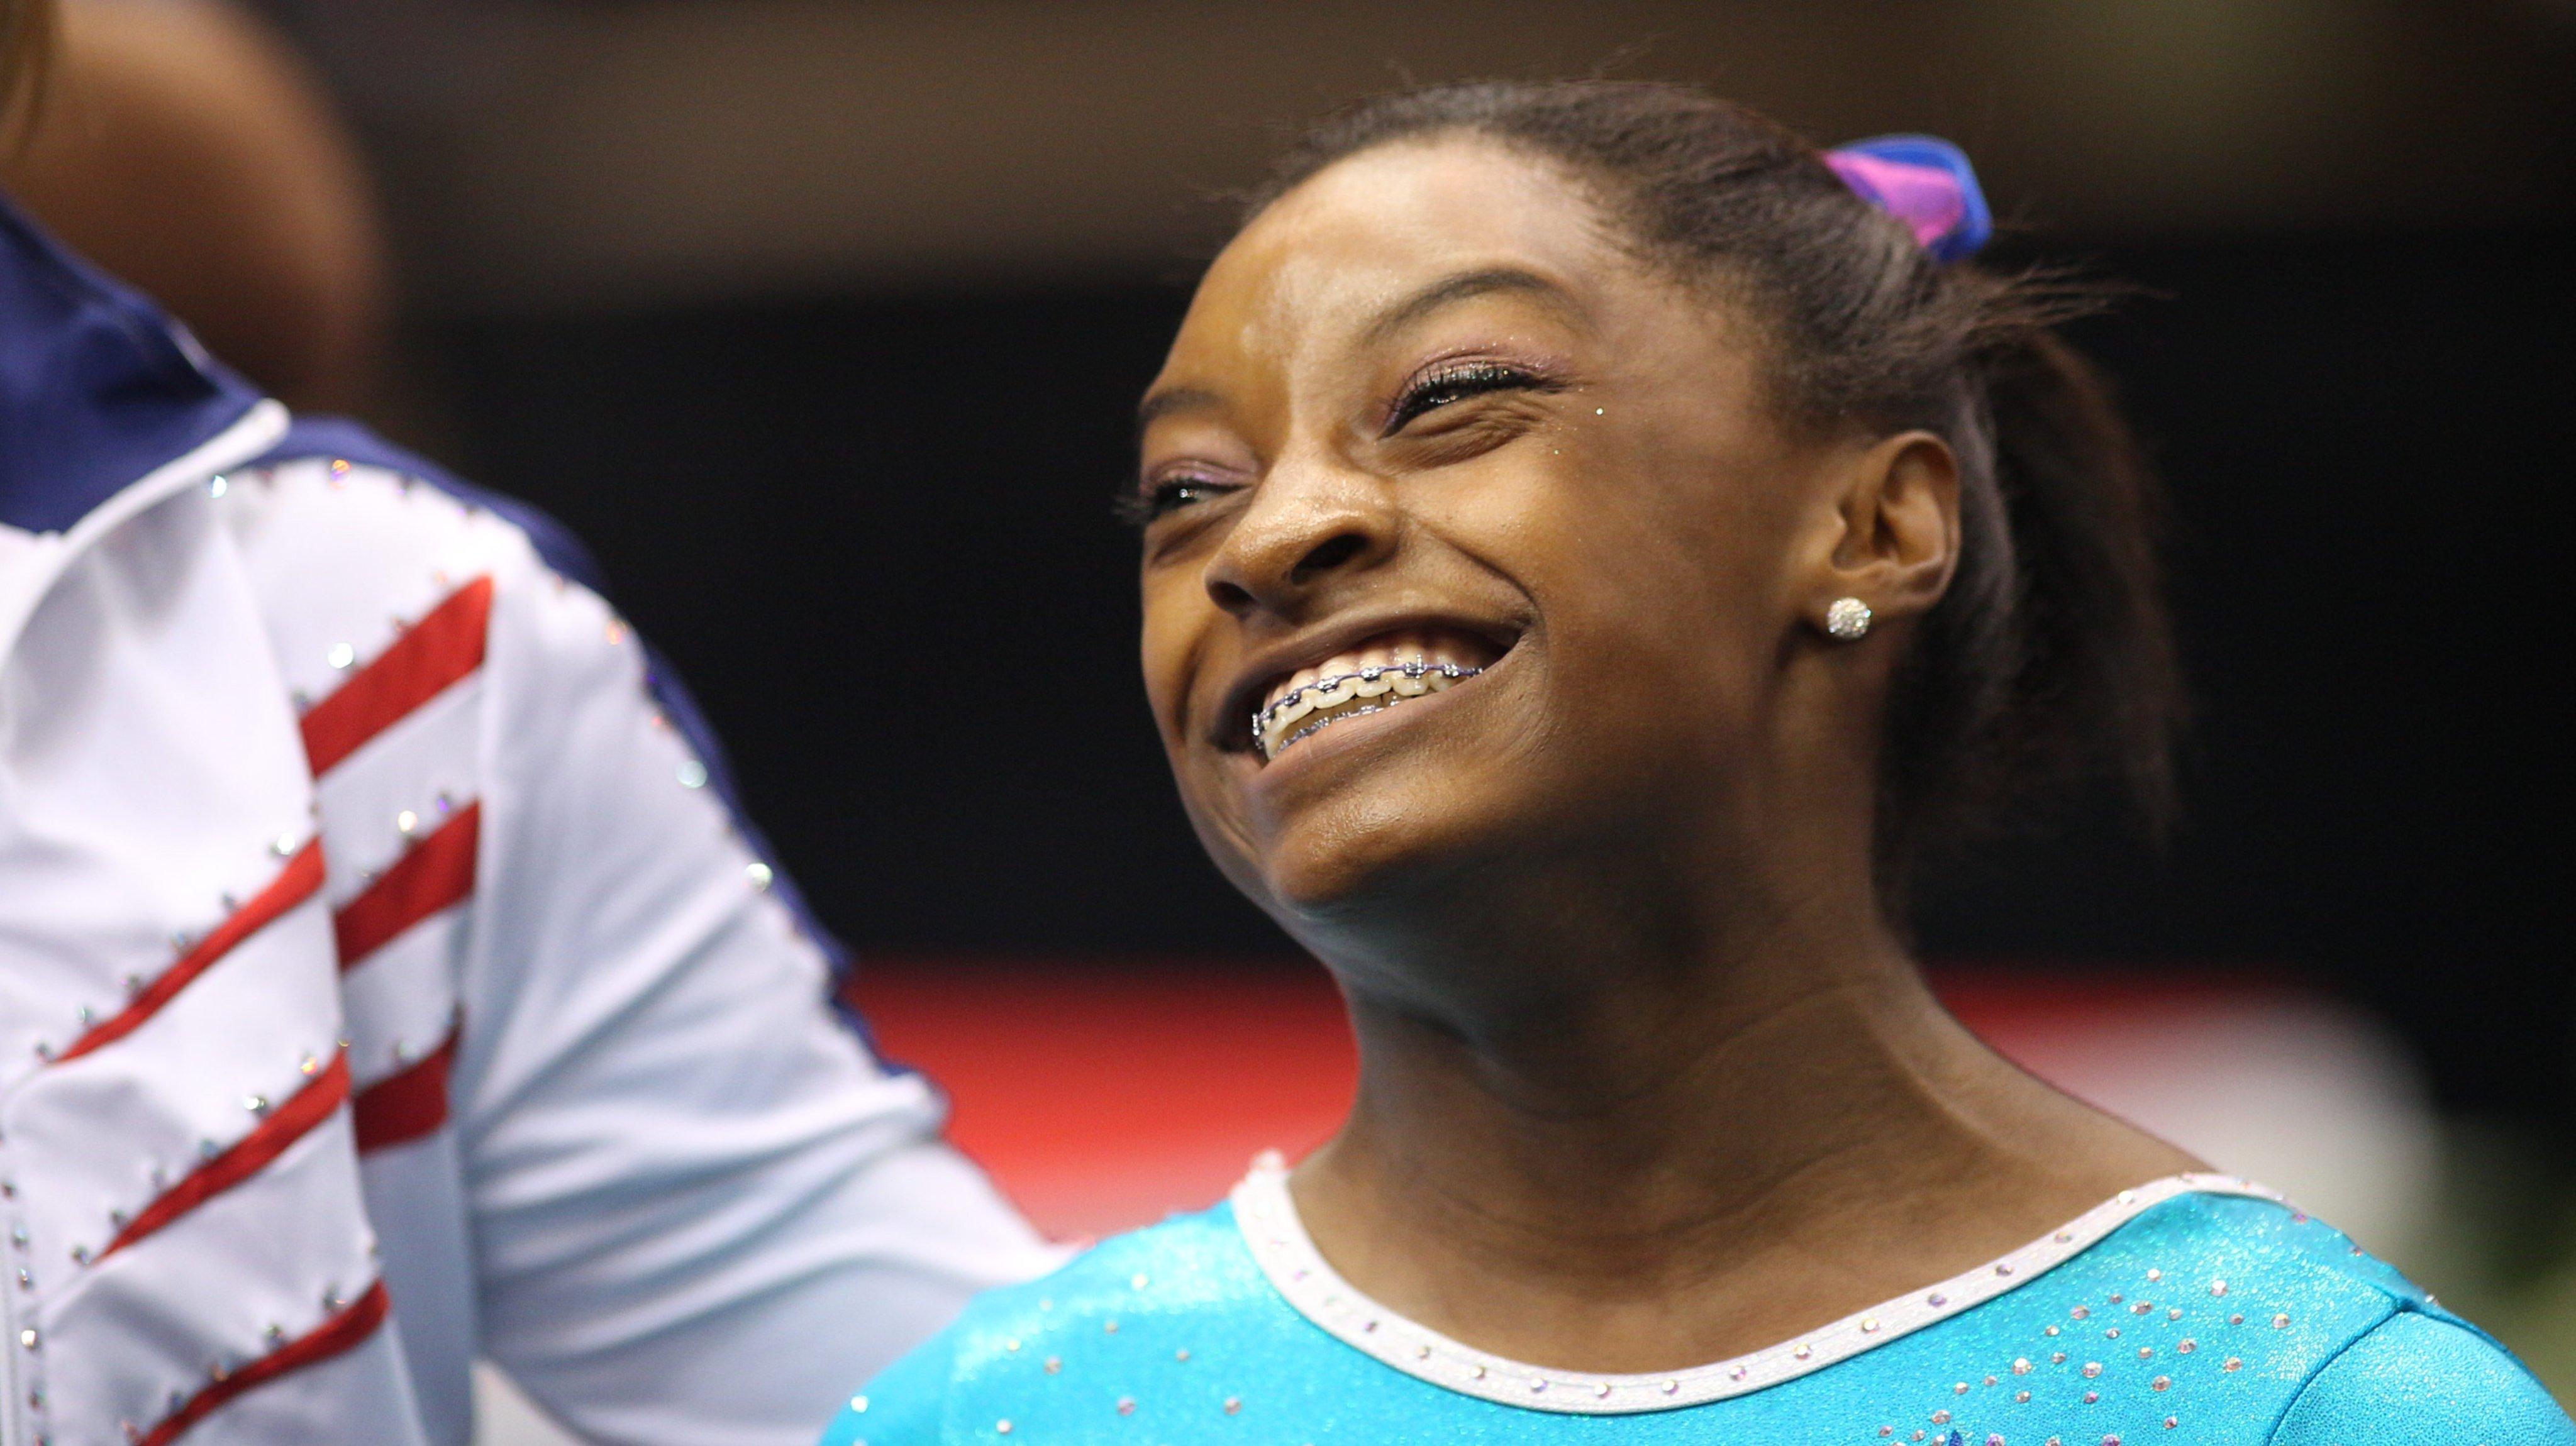 The 2013 P&G Gymnastics Championships, USA Gymnastics National Championships.